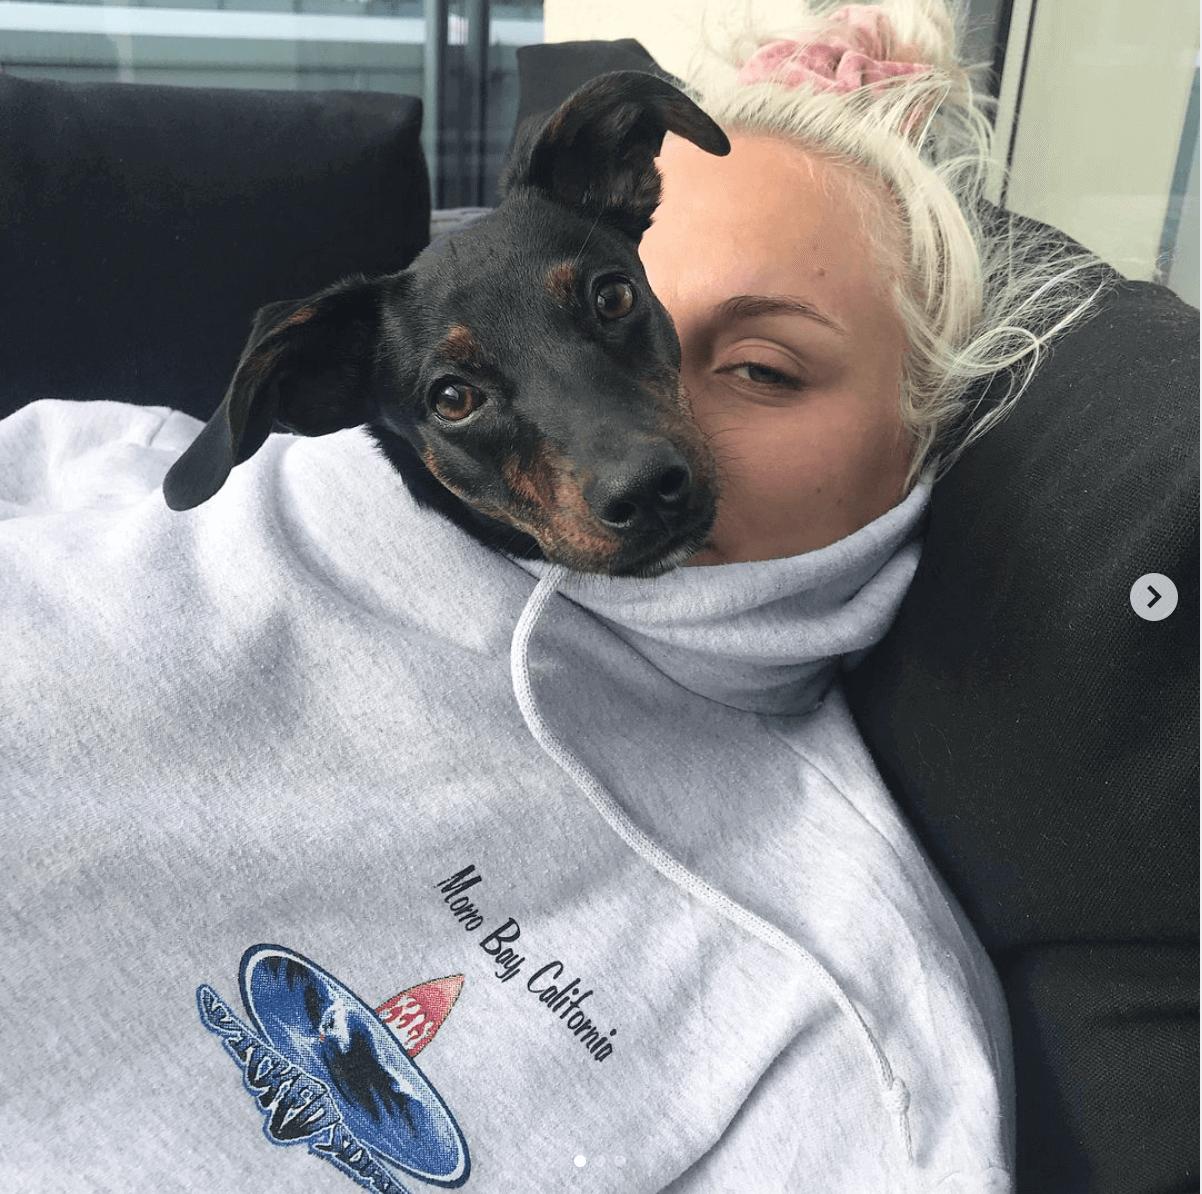 Tomine Harket koser med sin lille hund Miley, som inni genseren hennes.